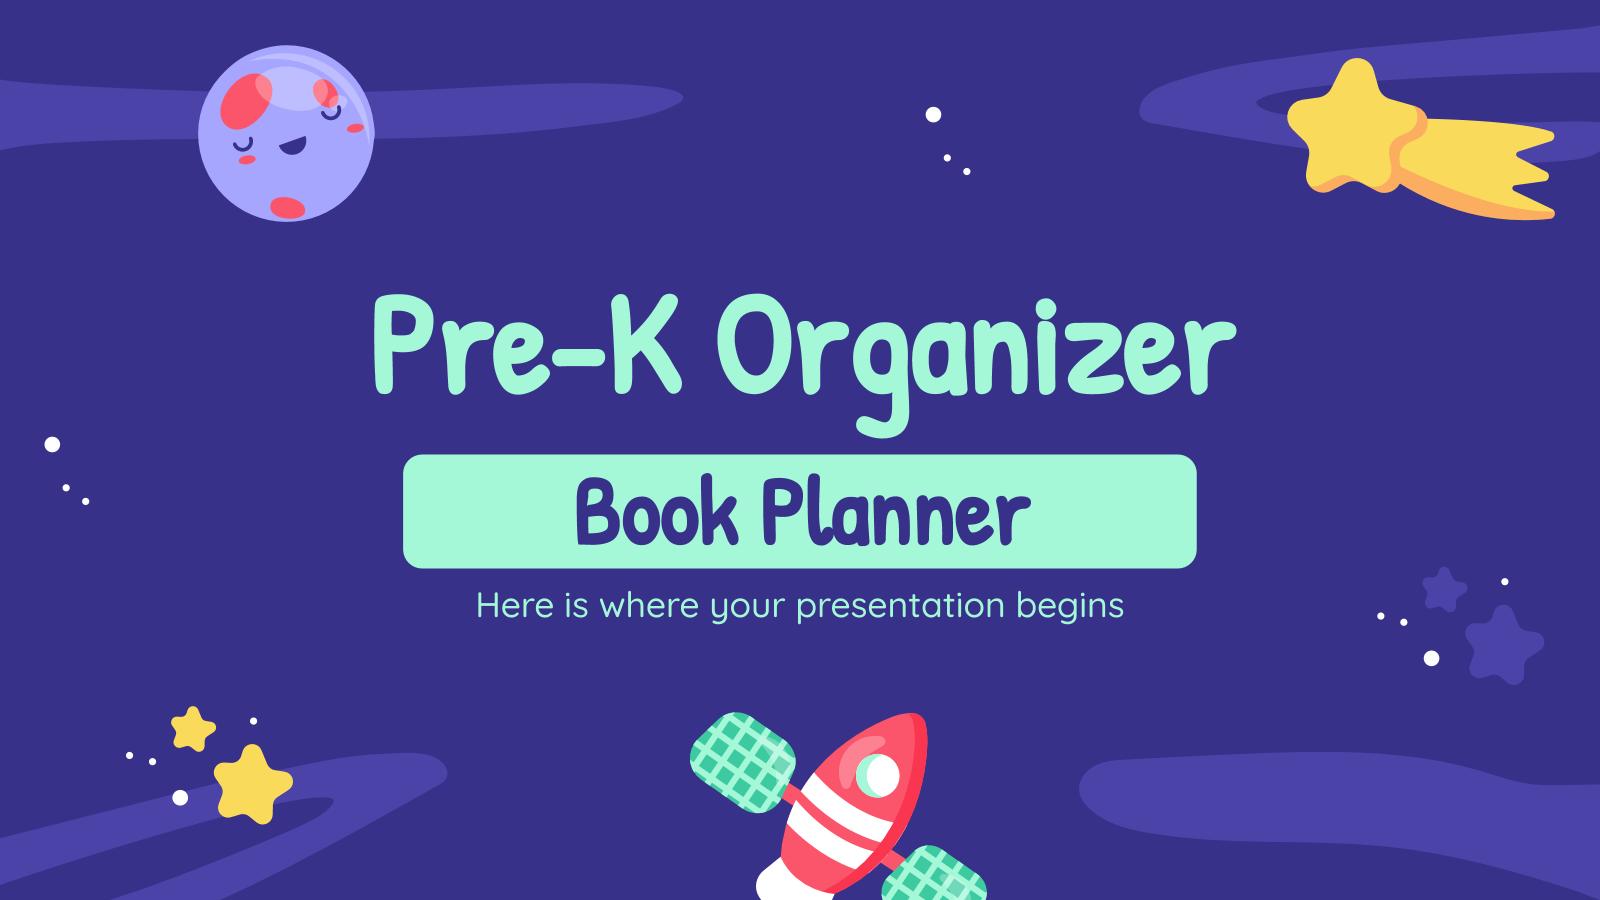 Pre-K Organizer - Book Planner presentation template